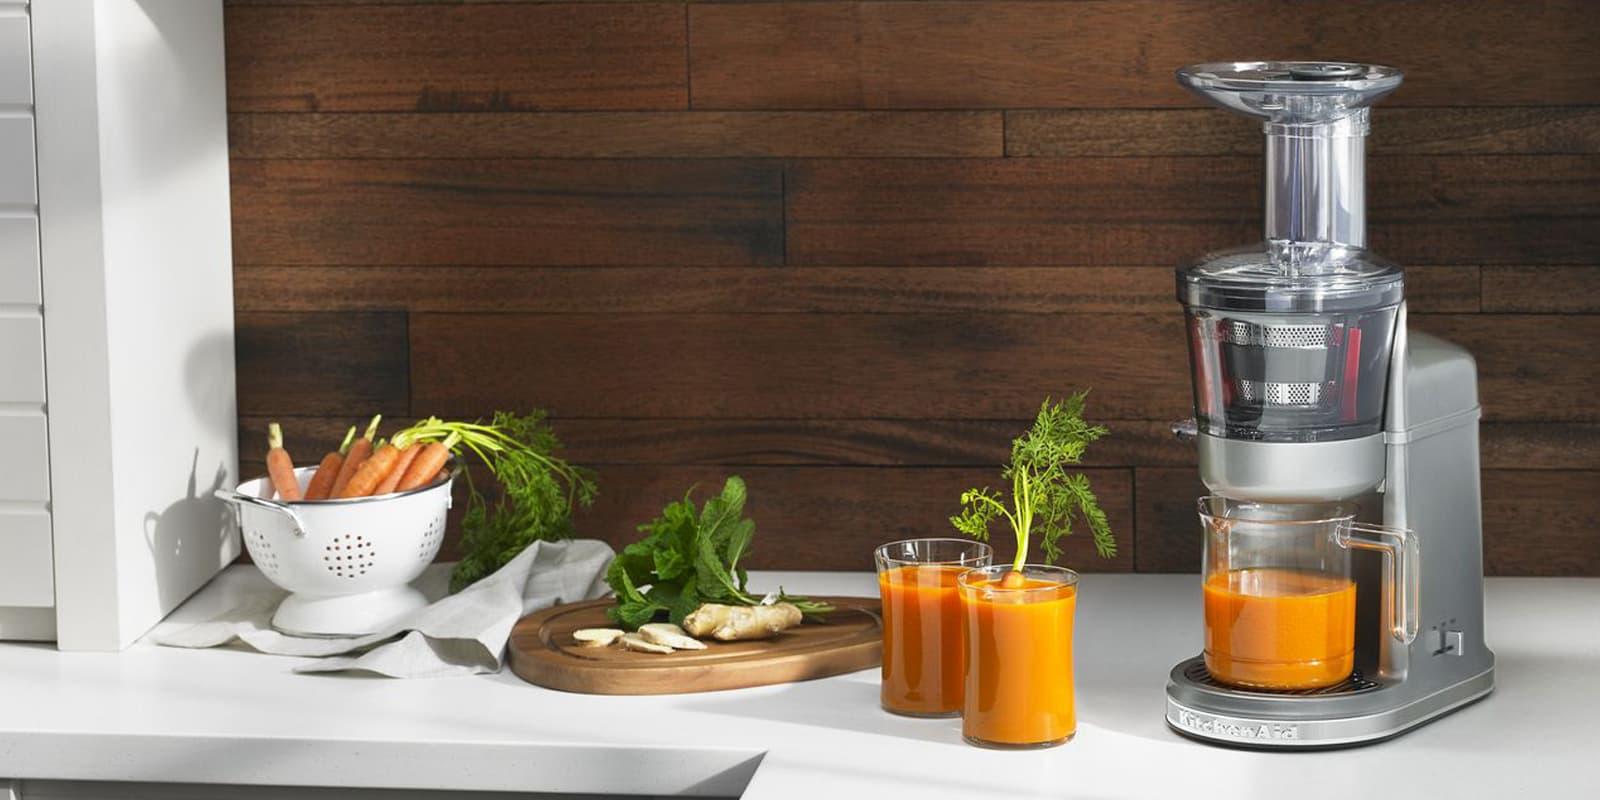 extracteur de jus artisan 5kvj0111 site officiel kitchenaid. Black Bedroom Furniture Sets. Home Design Ideas